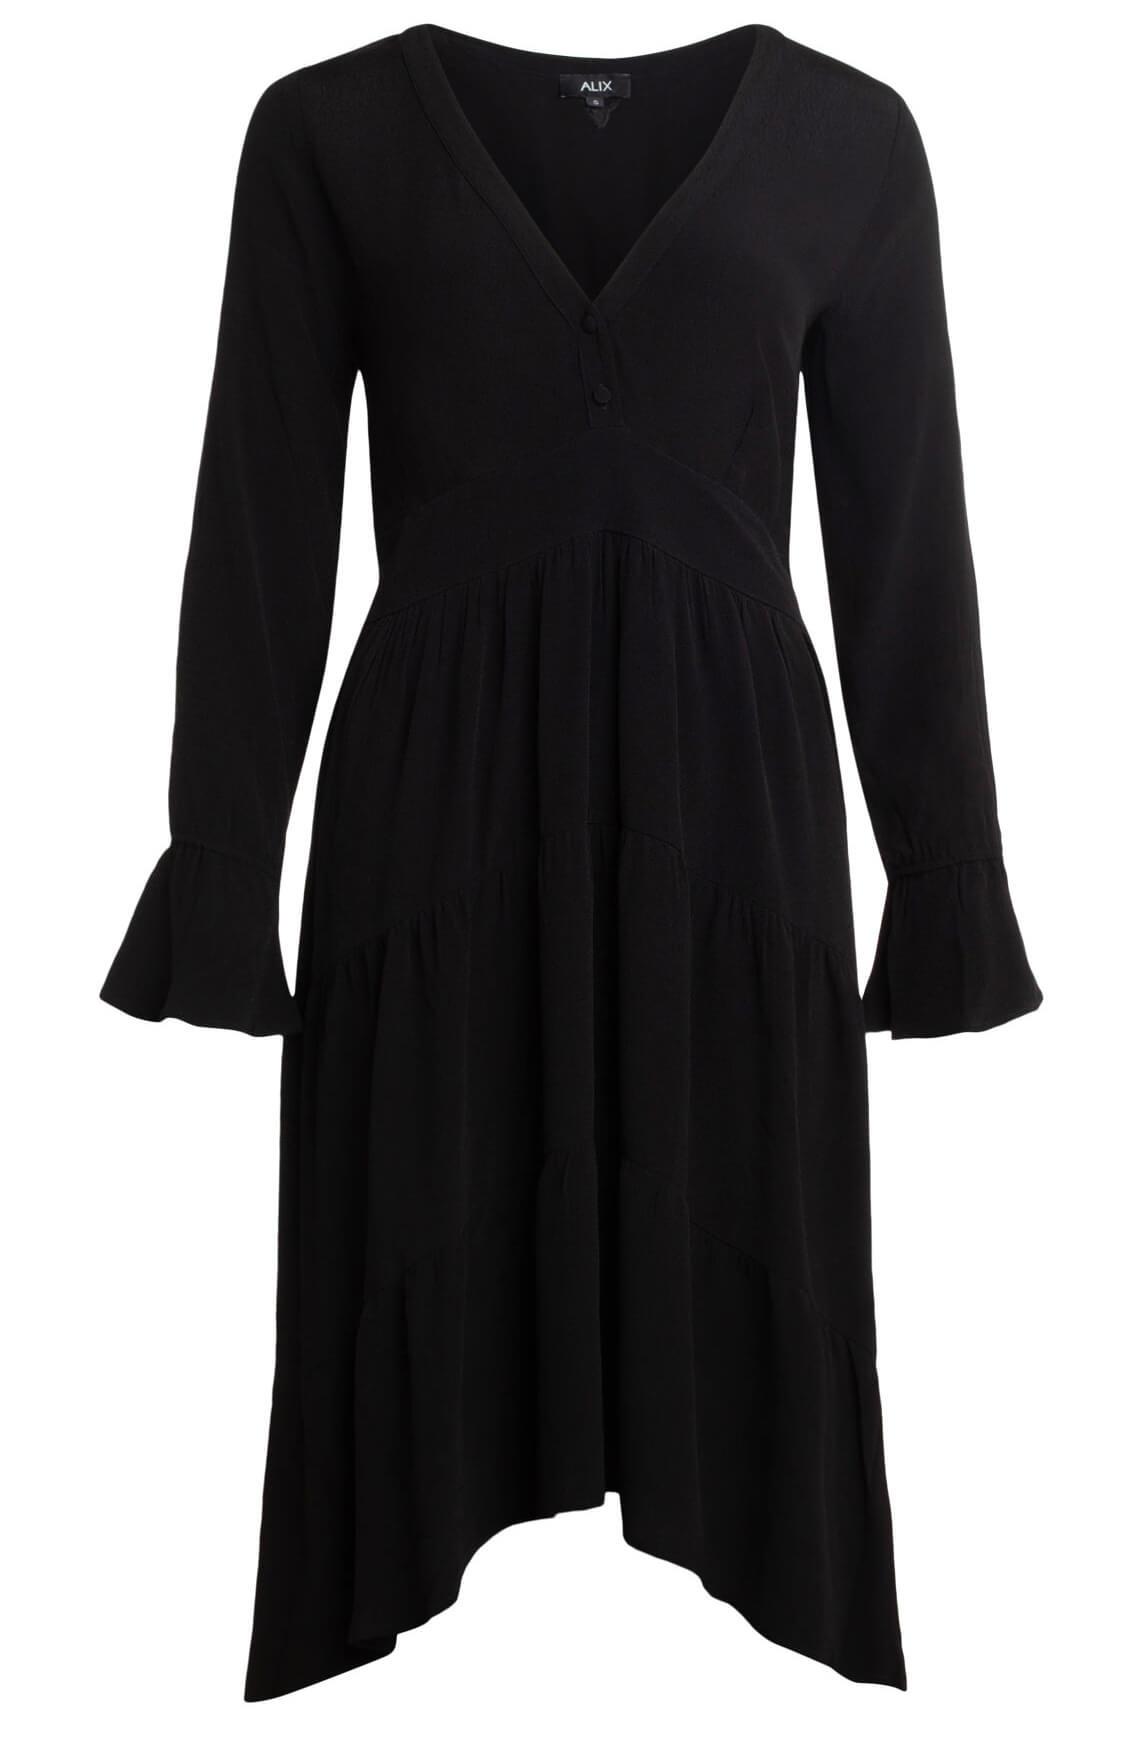 Alix The Label Dames Lange jurk zwart